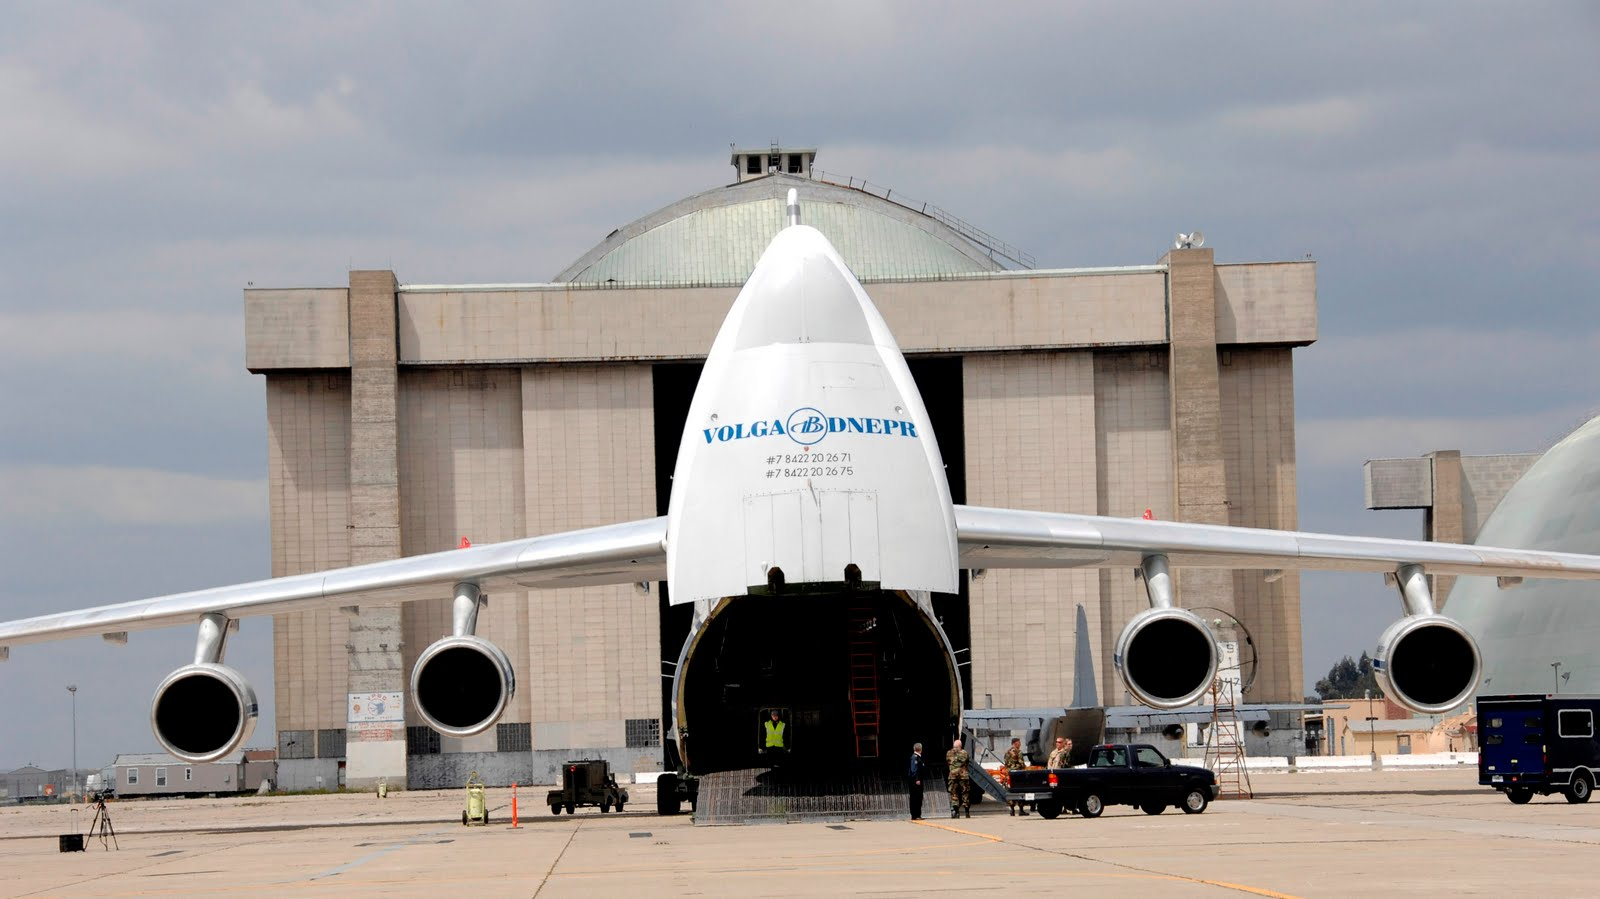 http://3.bp.blogspot.com/_ja676MG45Zg/TB2t4Xv6uxI/AAAAAAAADyE/s9gHzyZVKN4/s1600/Antonov-225-Noise-Opened-1.JPG